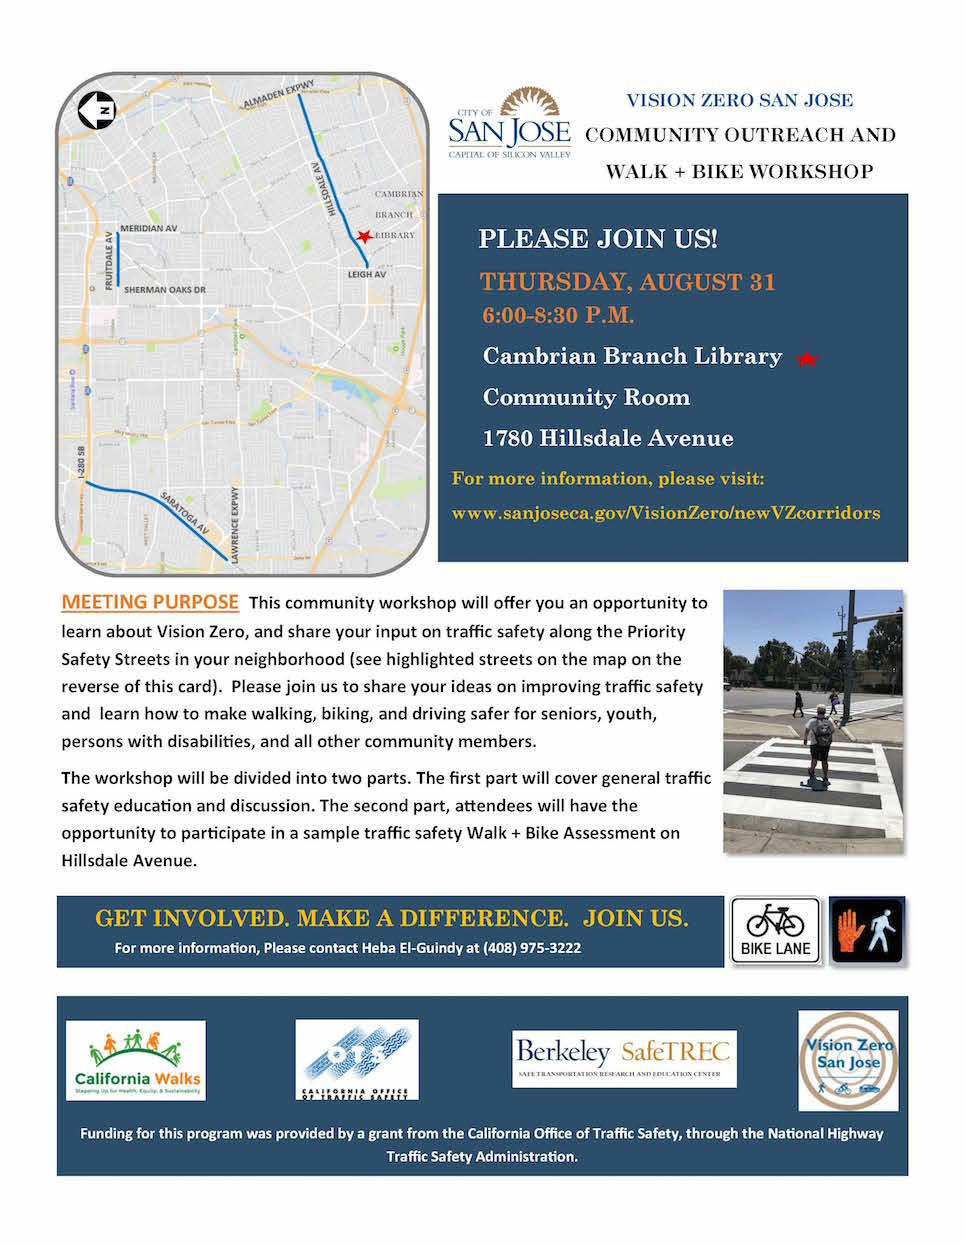 Vision Zero San Jose Community Outreach Workshop Flyer